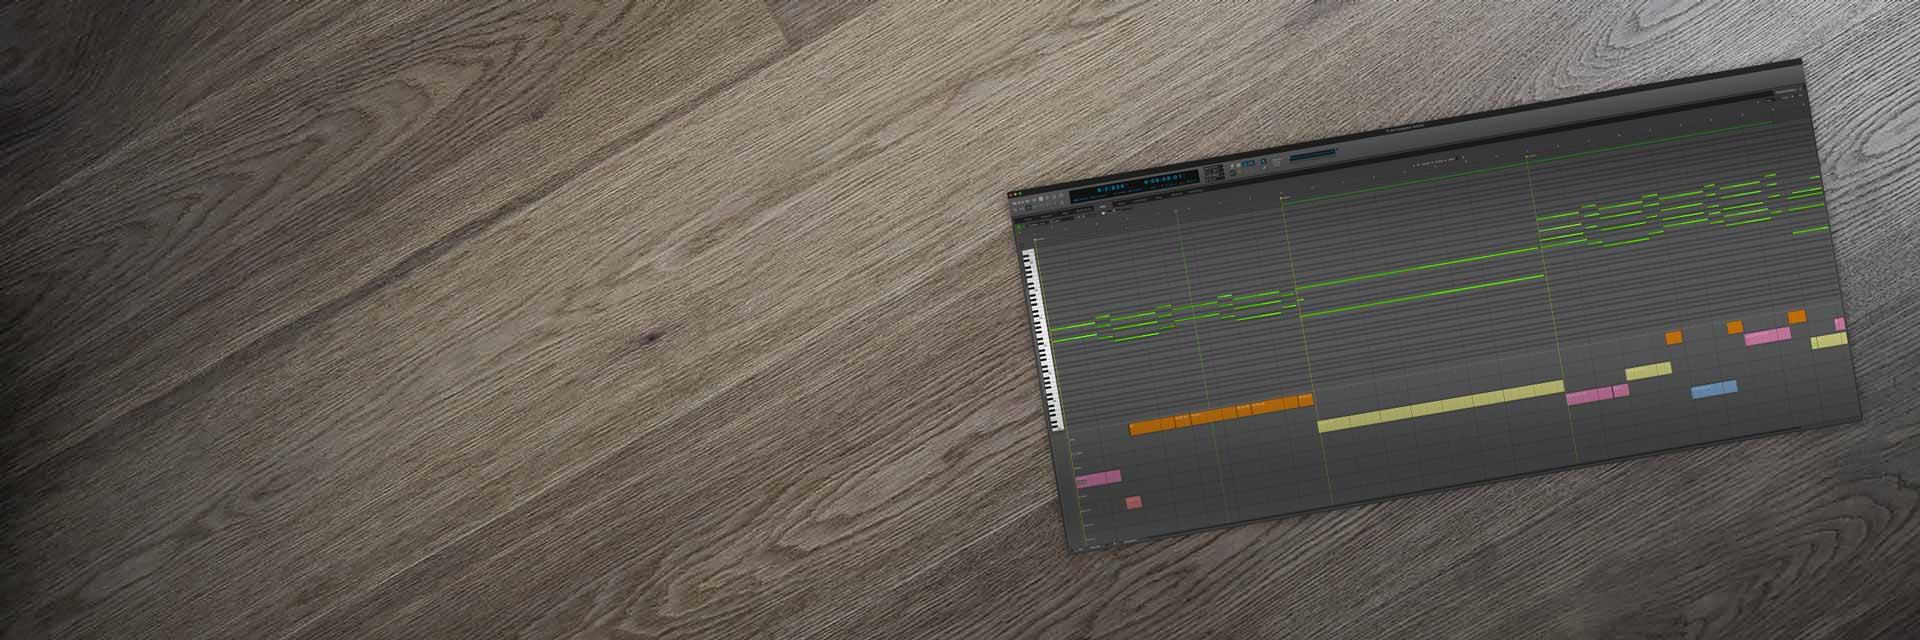 Art Conductor for Motu Digital Performer